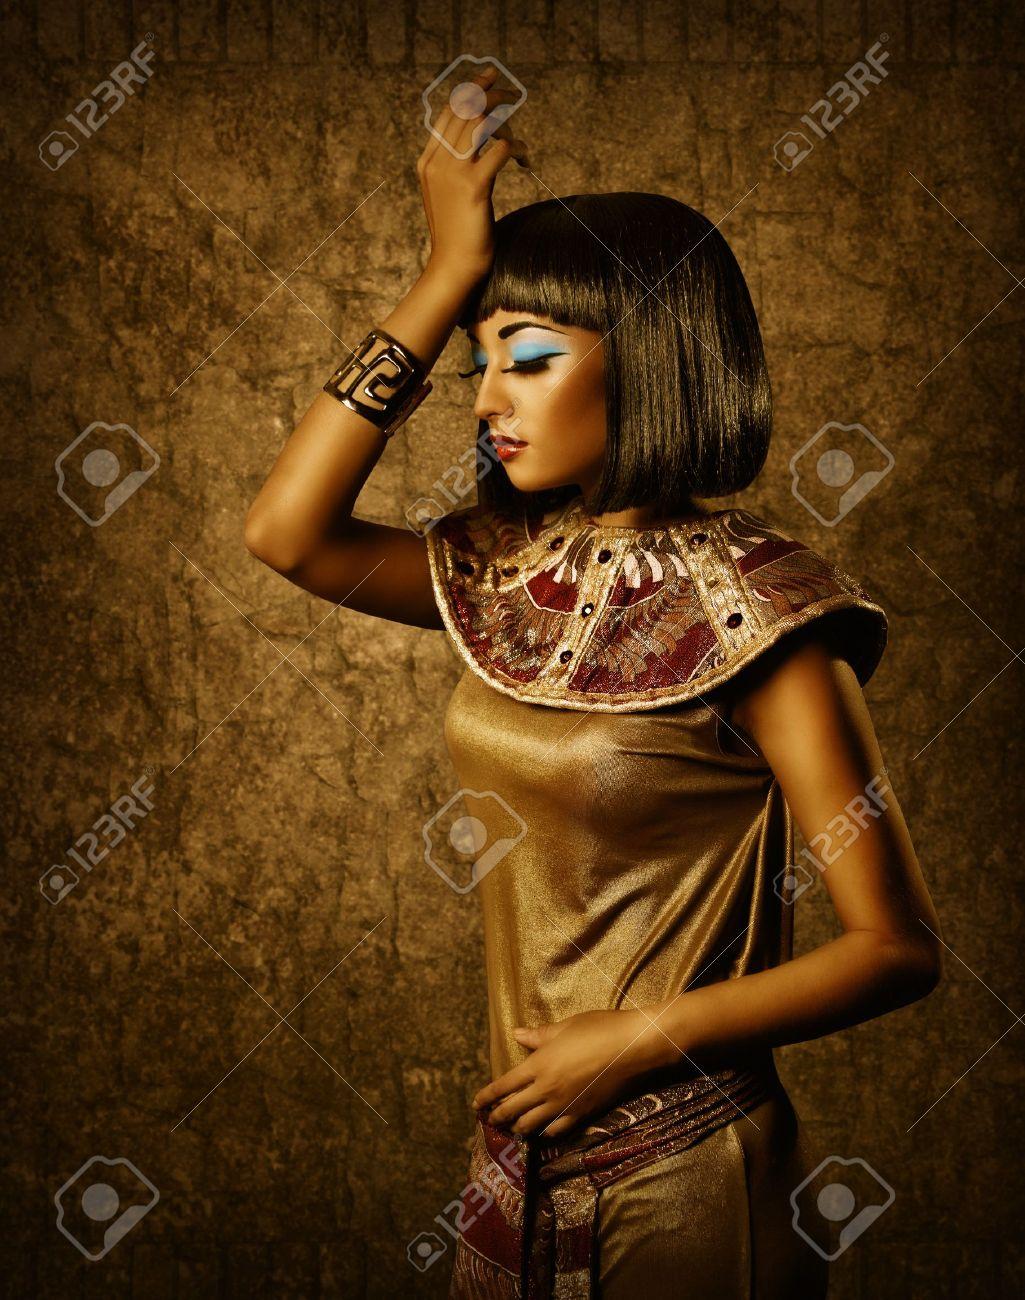 Beautiful egyptian woman bronze portrait over grunge dark gold background Stock Photo - 22128779